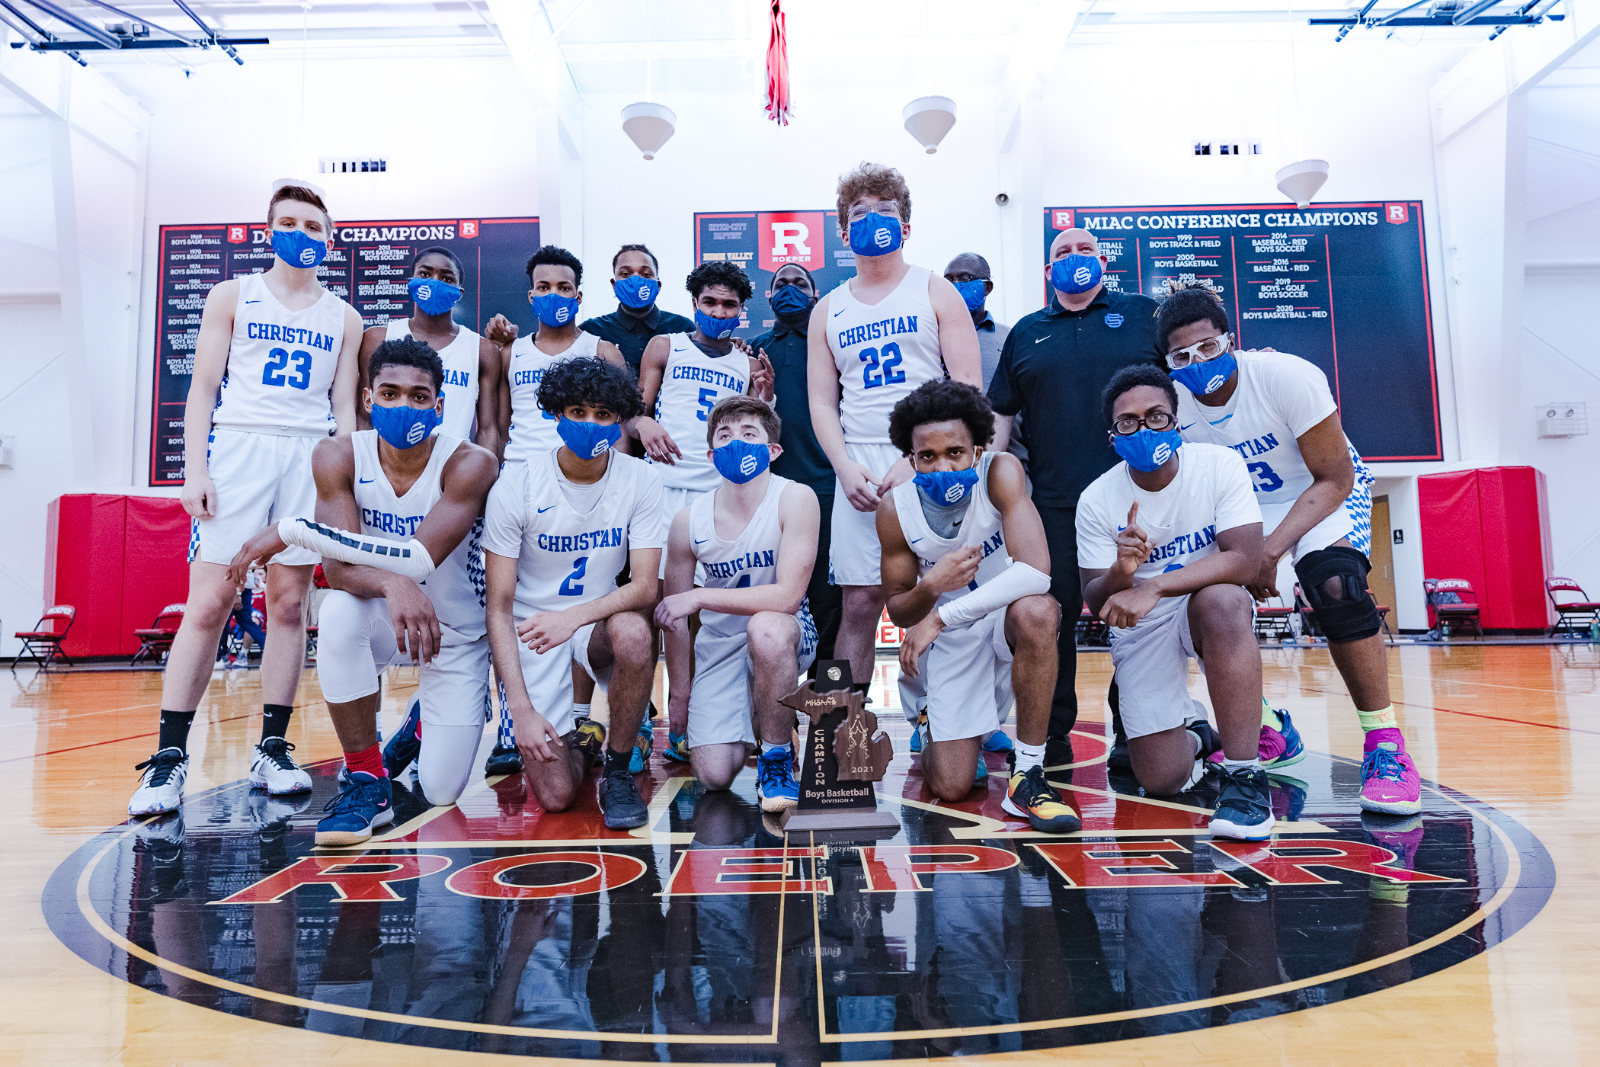 Boys Basketball District Pics Courtesy of D. Veldman